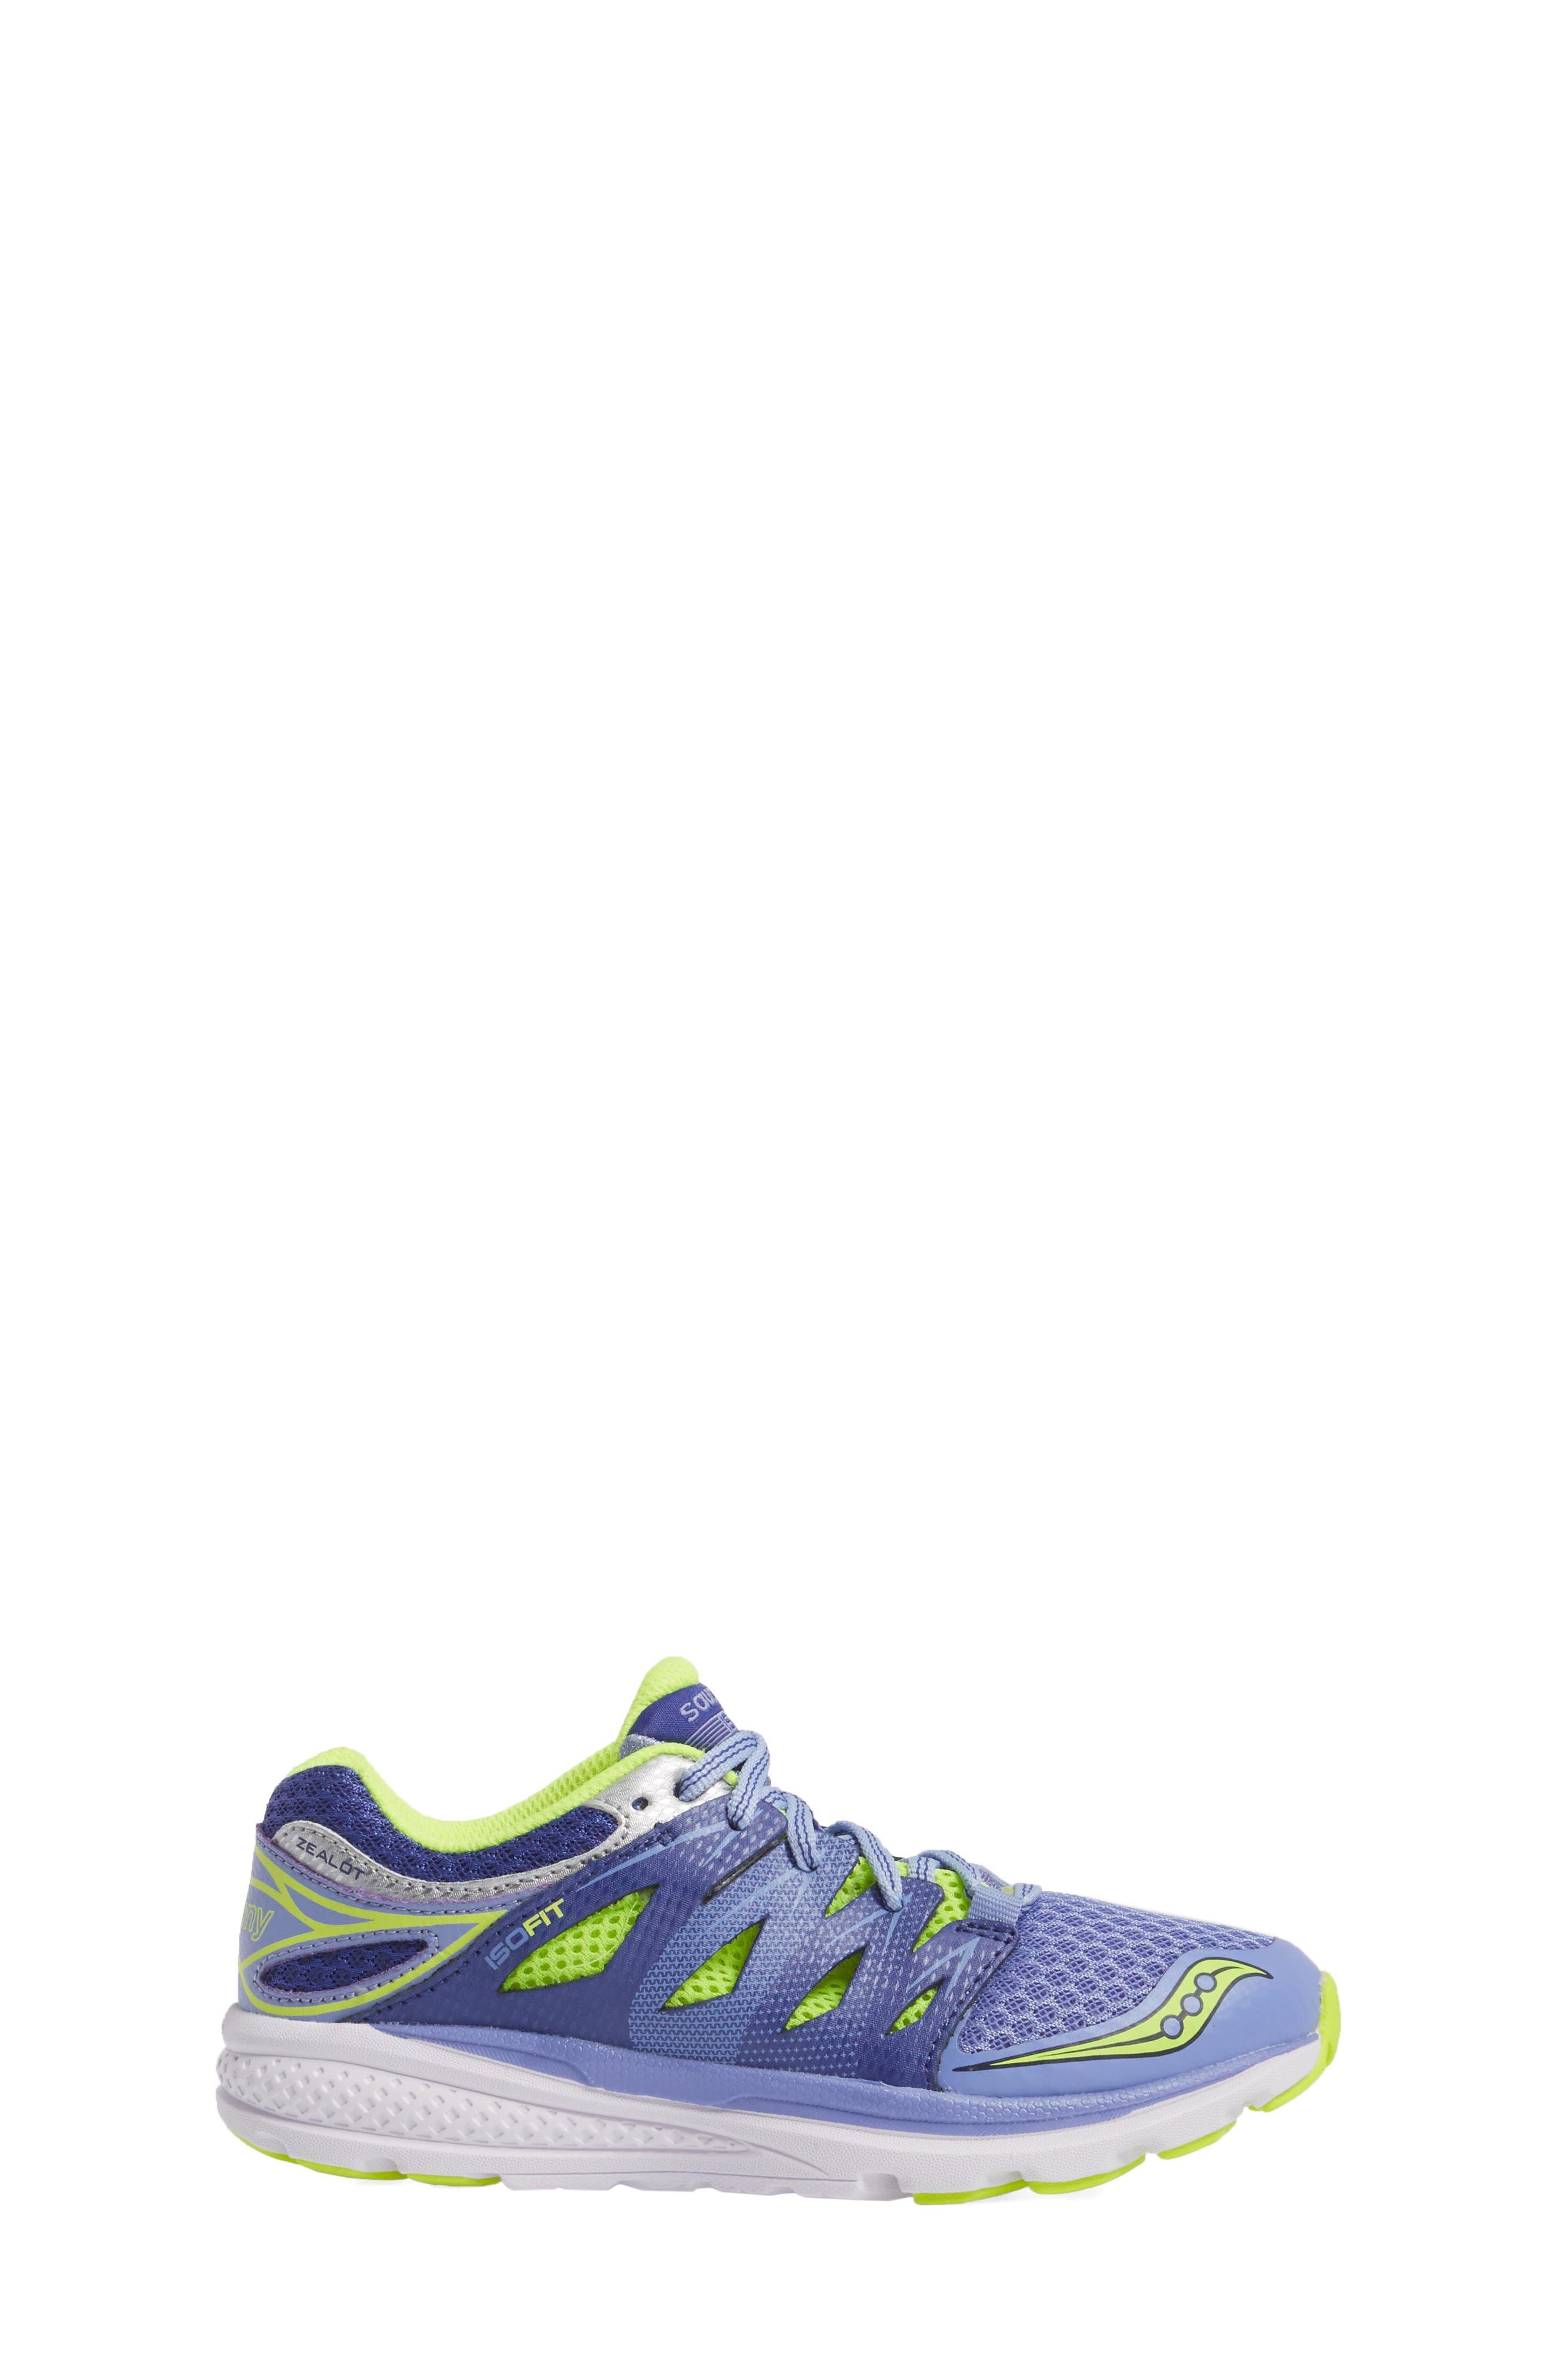 'Zealot 2' Sneaker,                             Alternate thumbnail 3, color,                             500